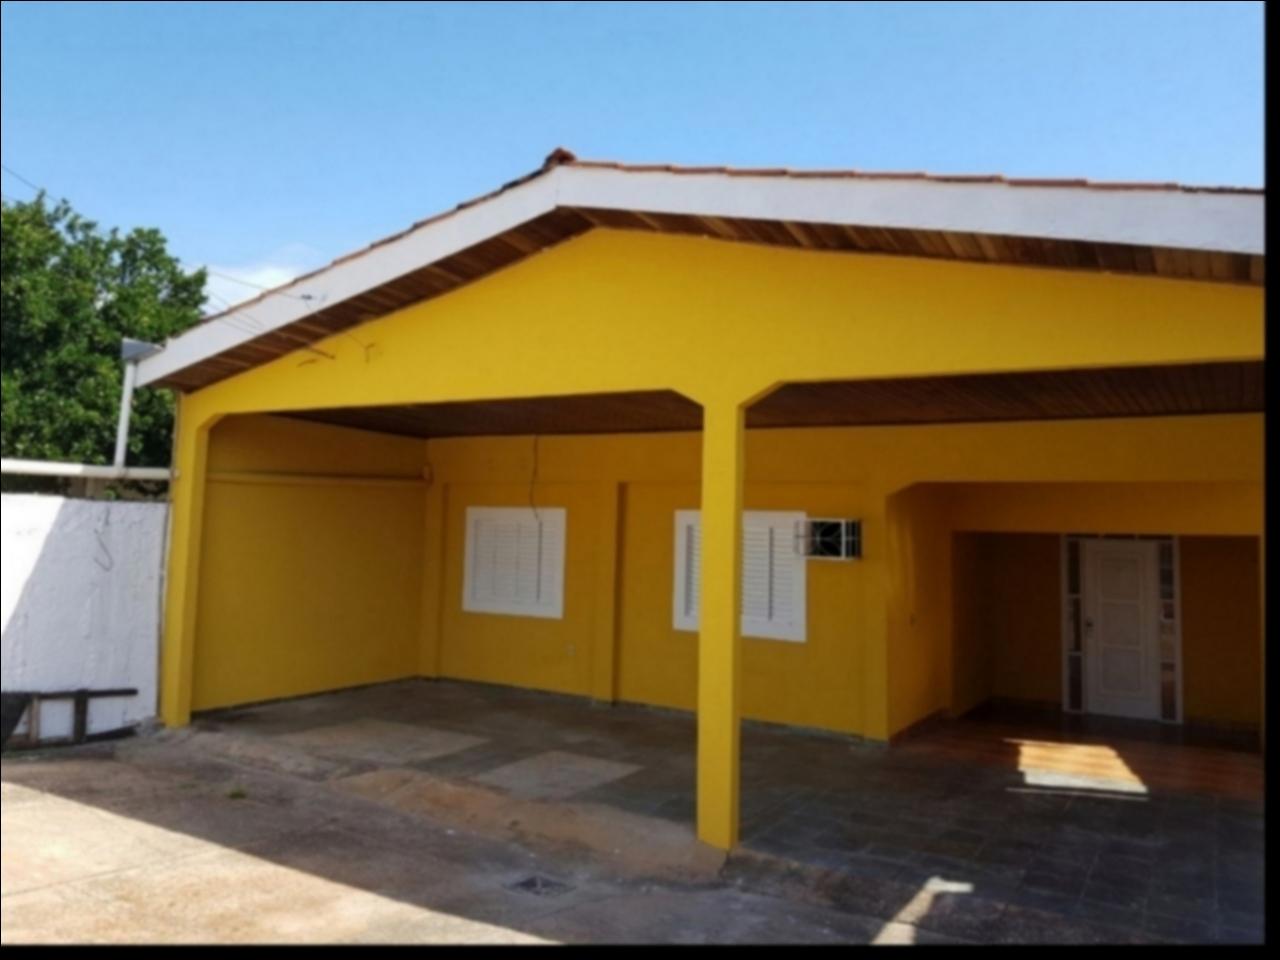 Casa  com 3 quartos sendo 1 suíte no Tijucal, Cuiabá  - MT